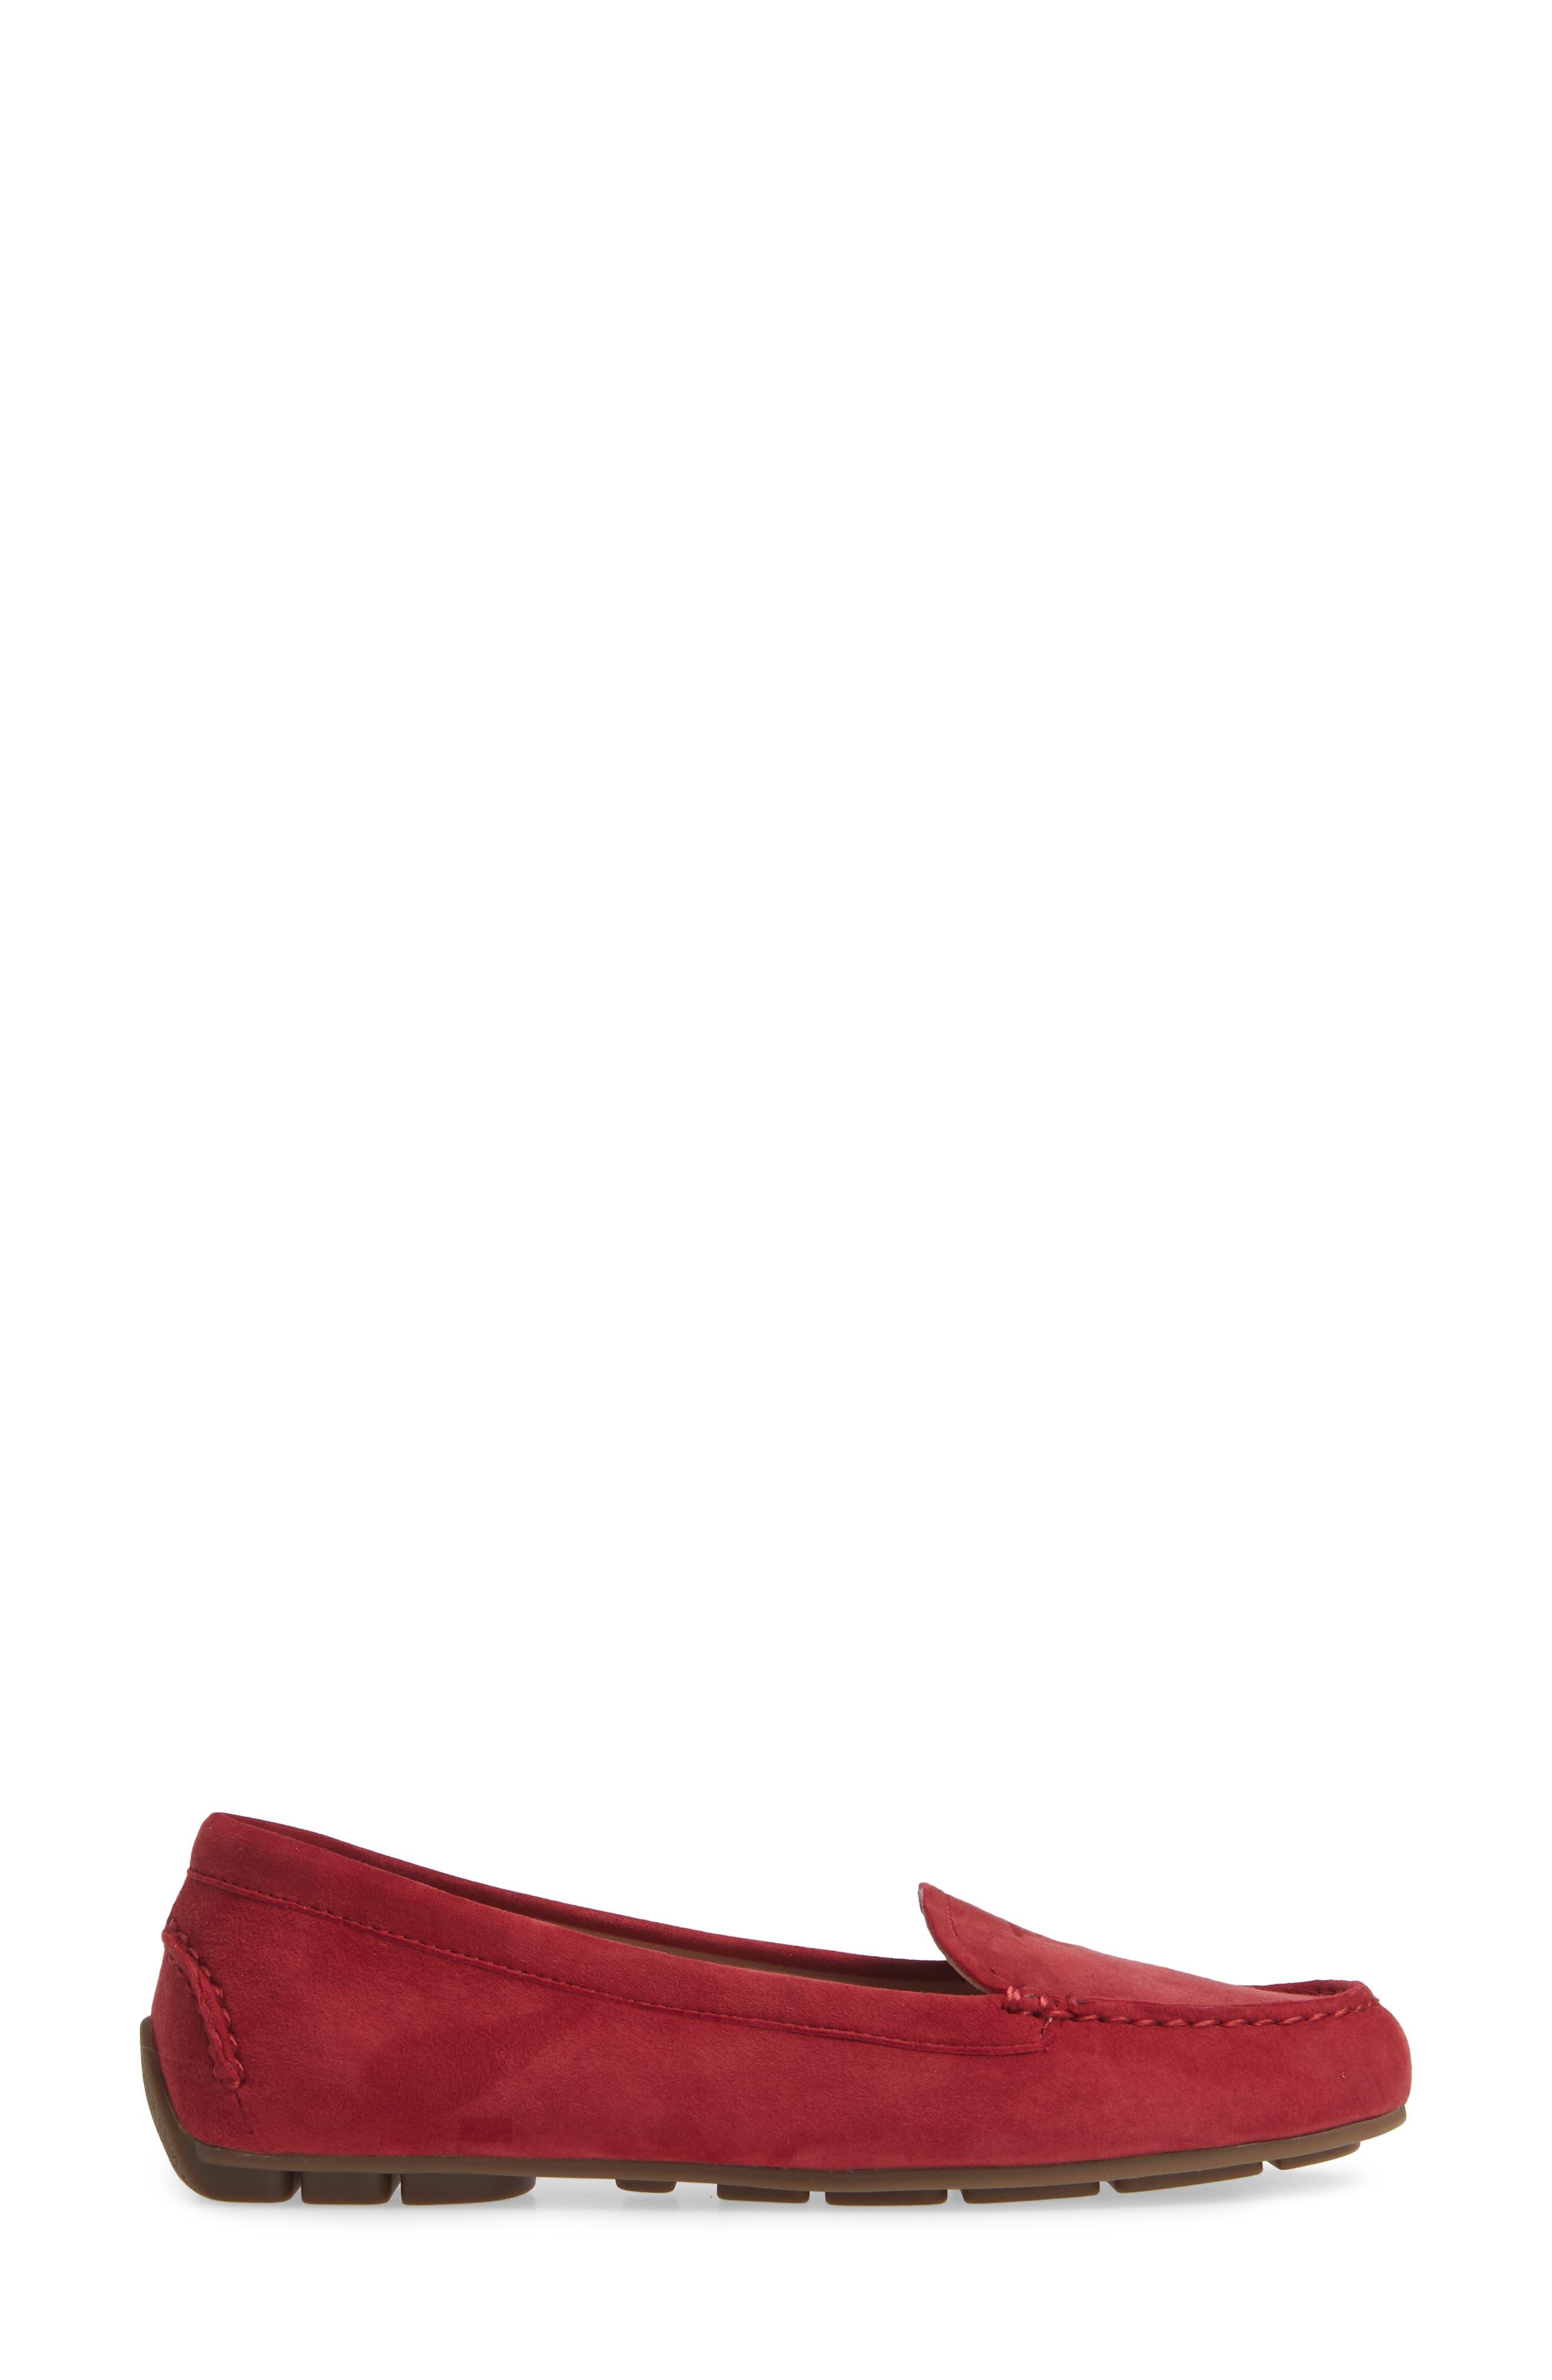 TARYN ROSE, Karen Water Resistant Driving Loafer, Alternate thumbnail 3, color, 602